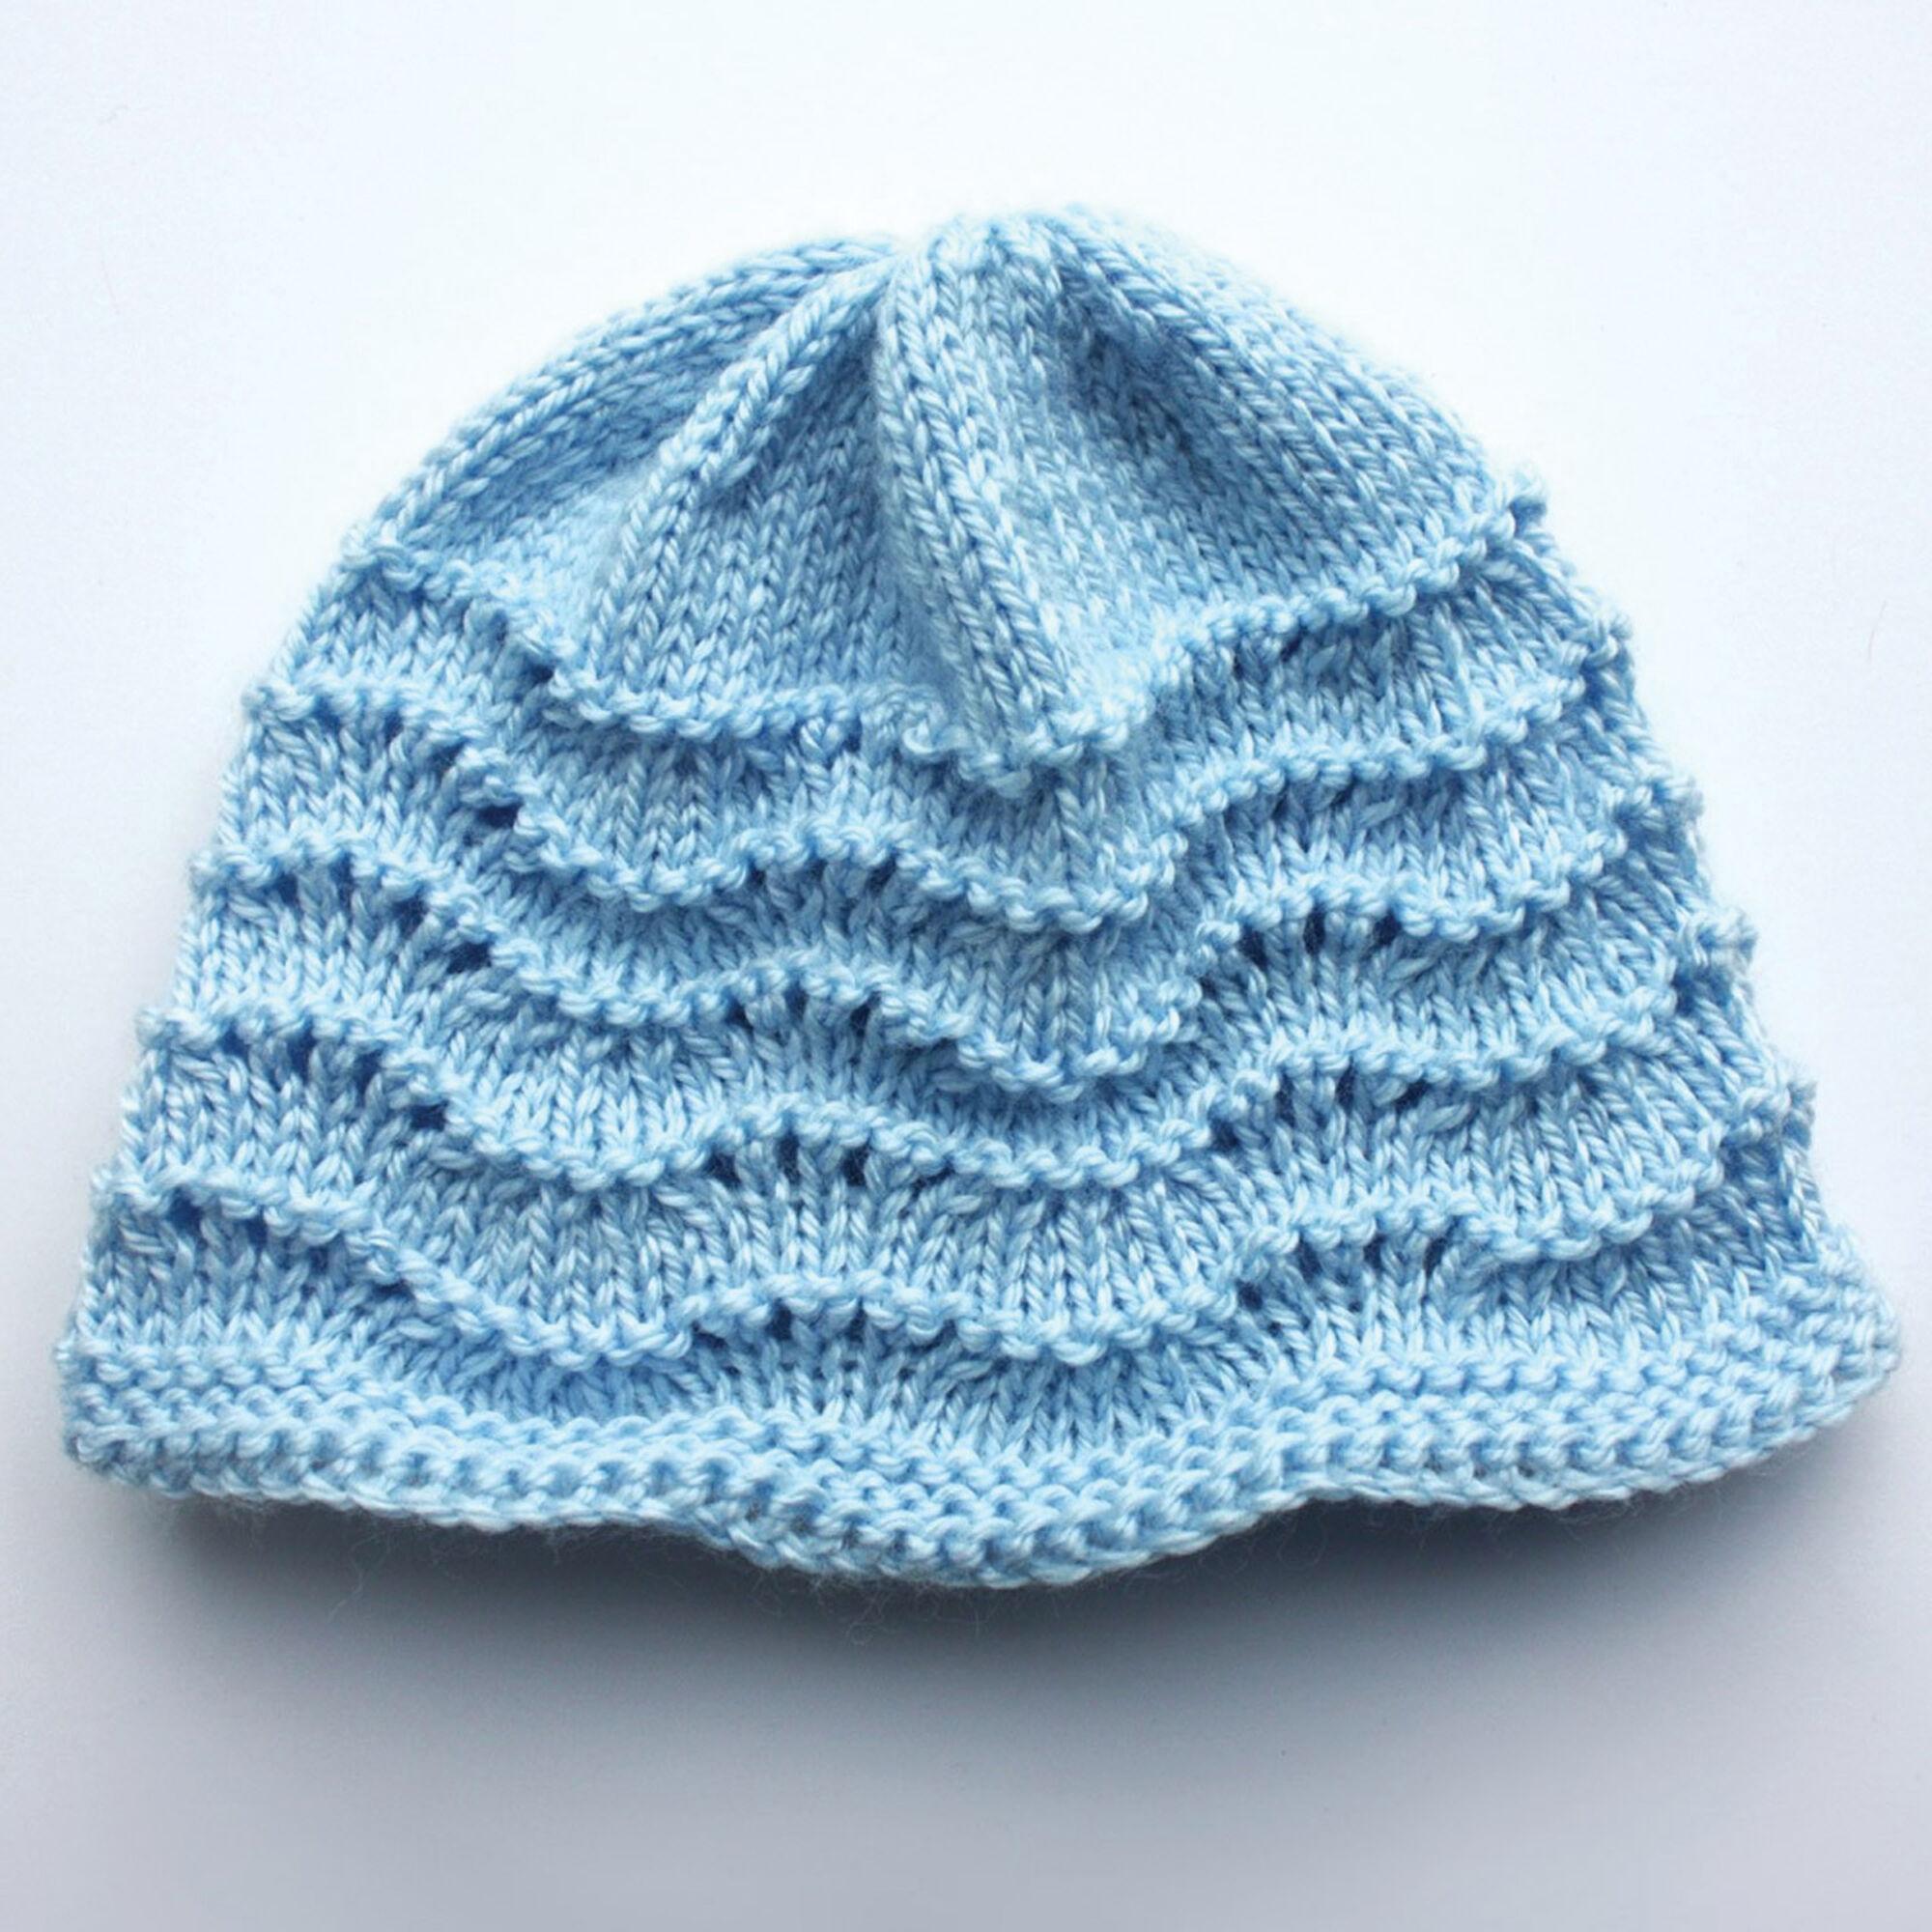 26e6ac525dc85 Bernat Knit Baby Hat, Pink - Preemie   Yarnspirations